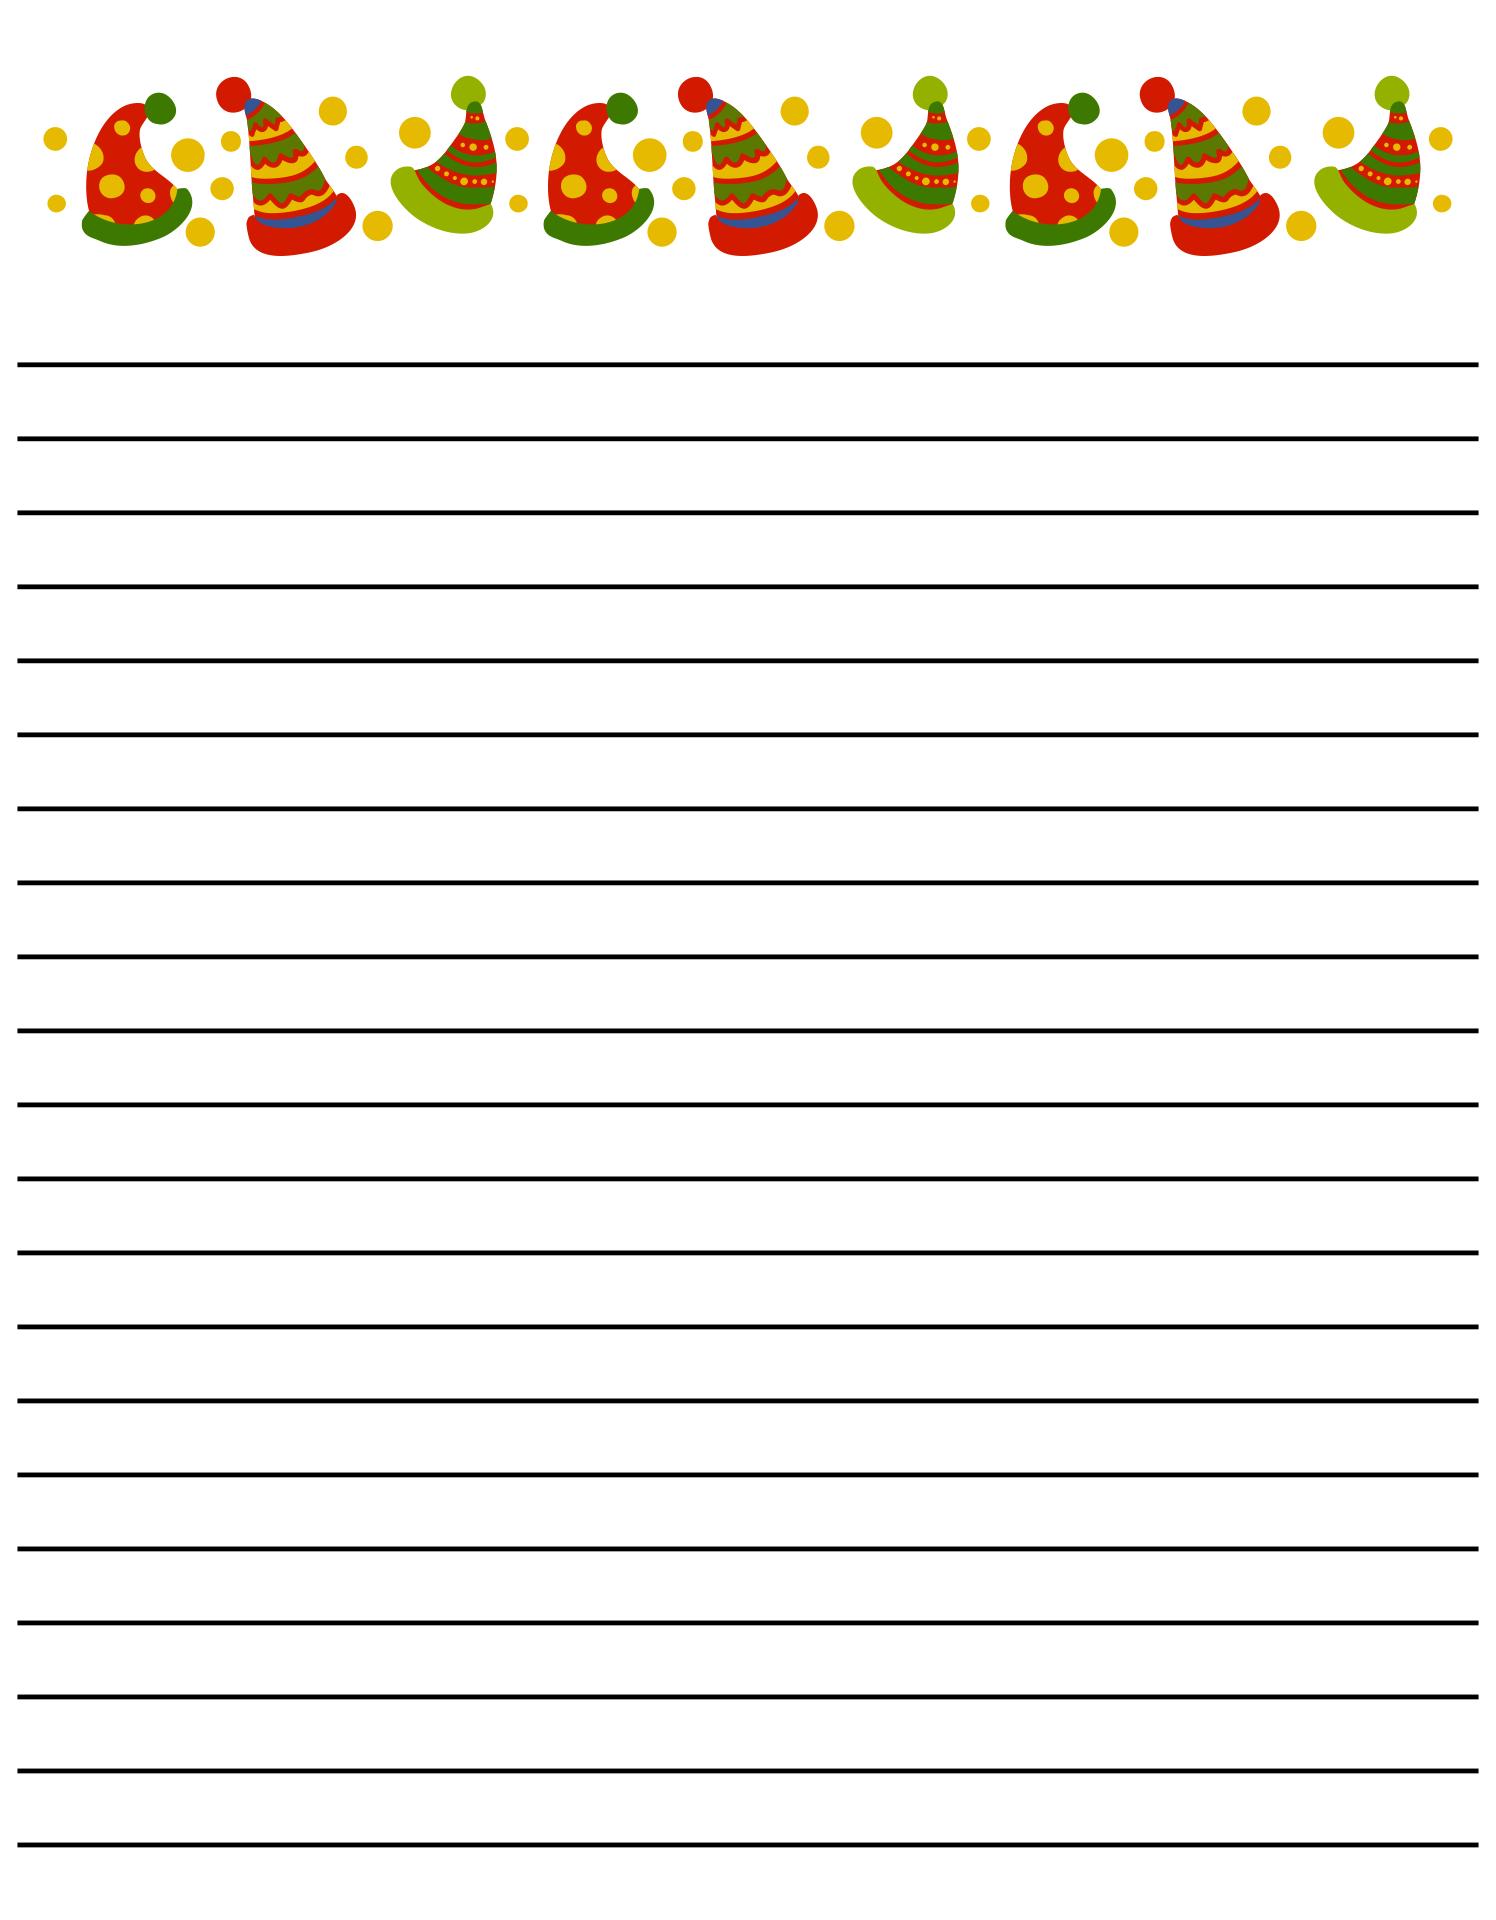 Printable Christmas Lined Writing Paper